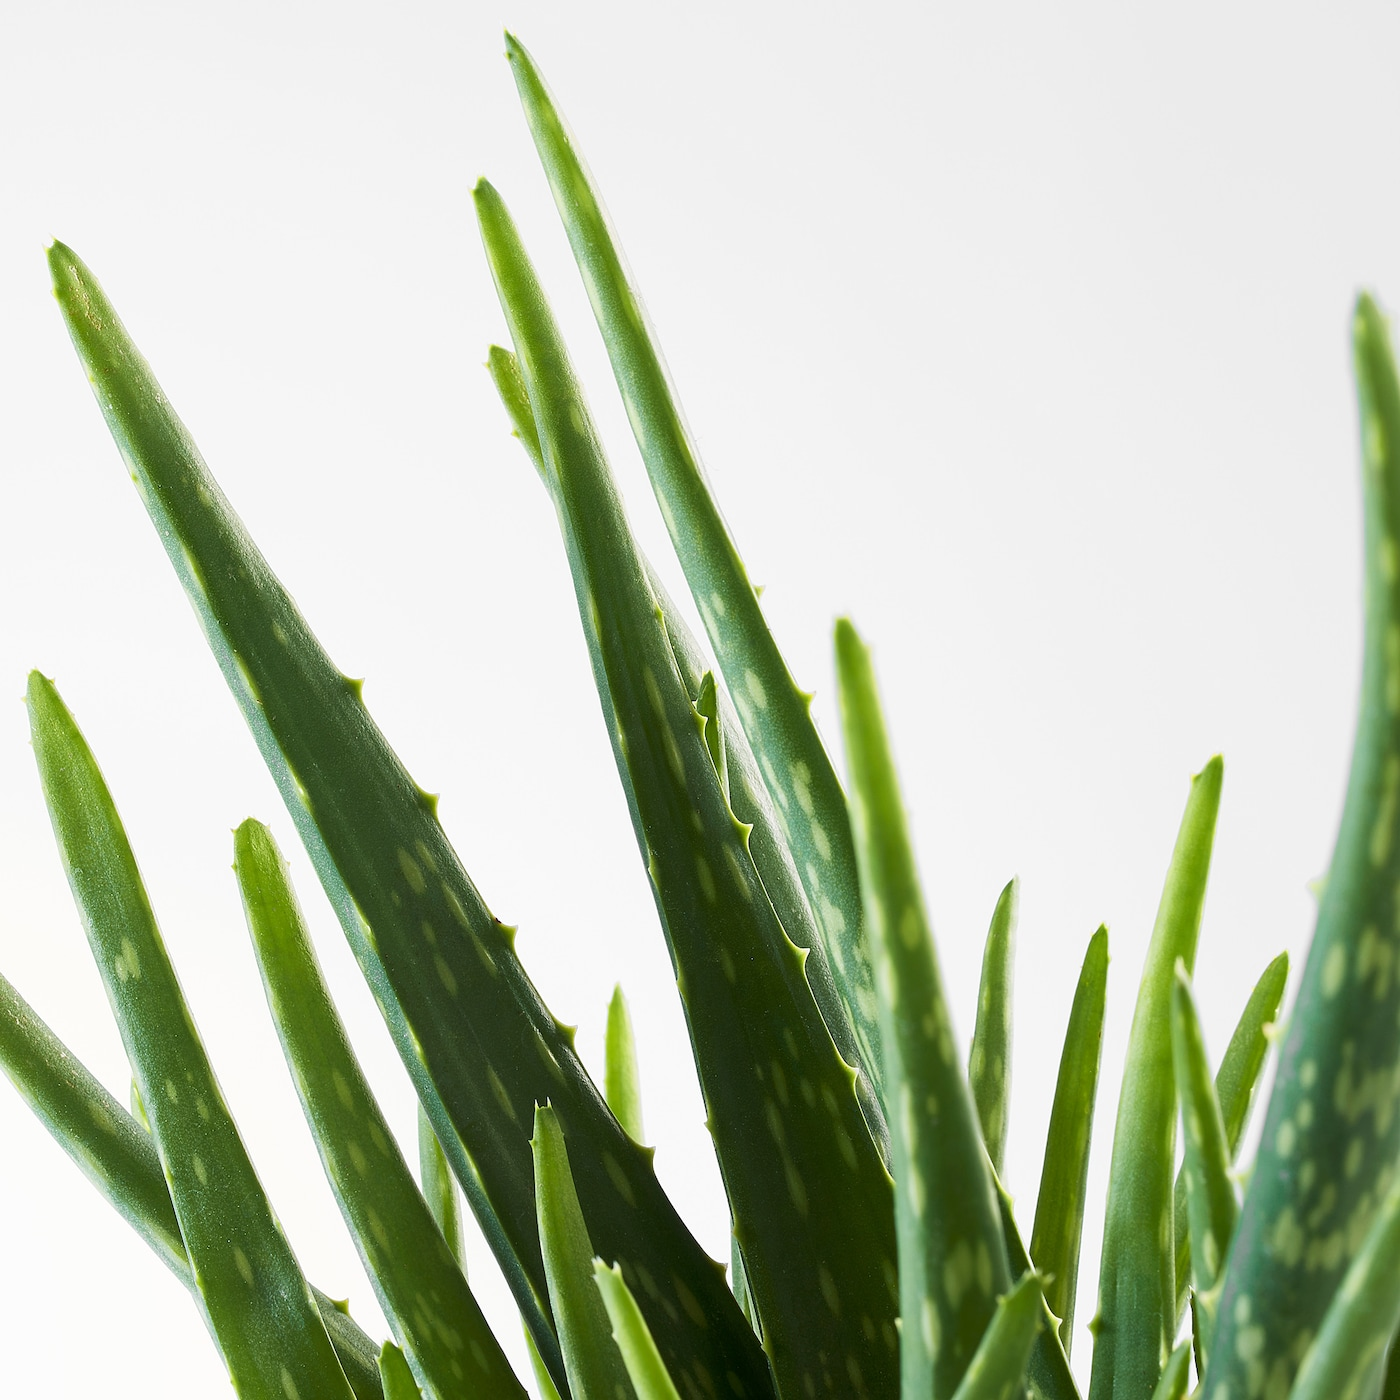 Comment Entretenir Une Plante Aloe Vera aloe vera plante en pot - aloe 12 cm